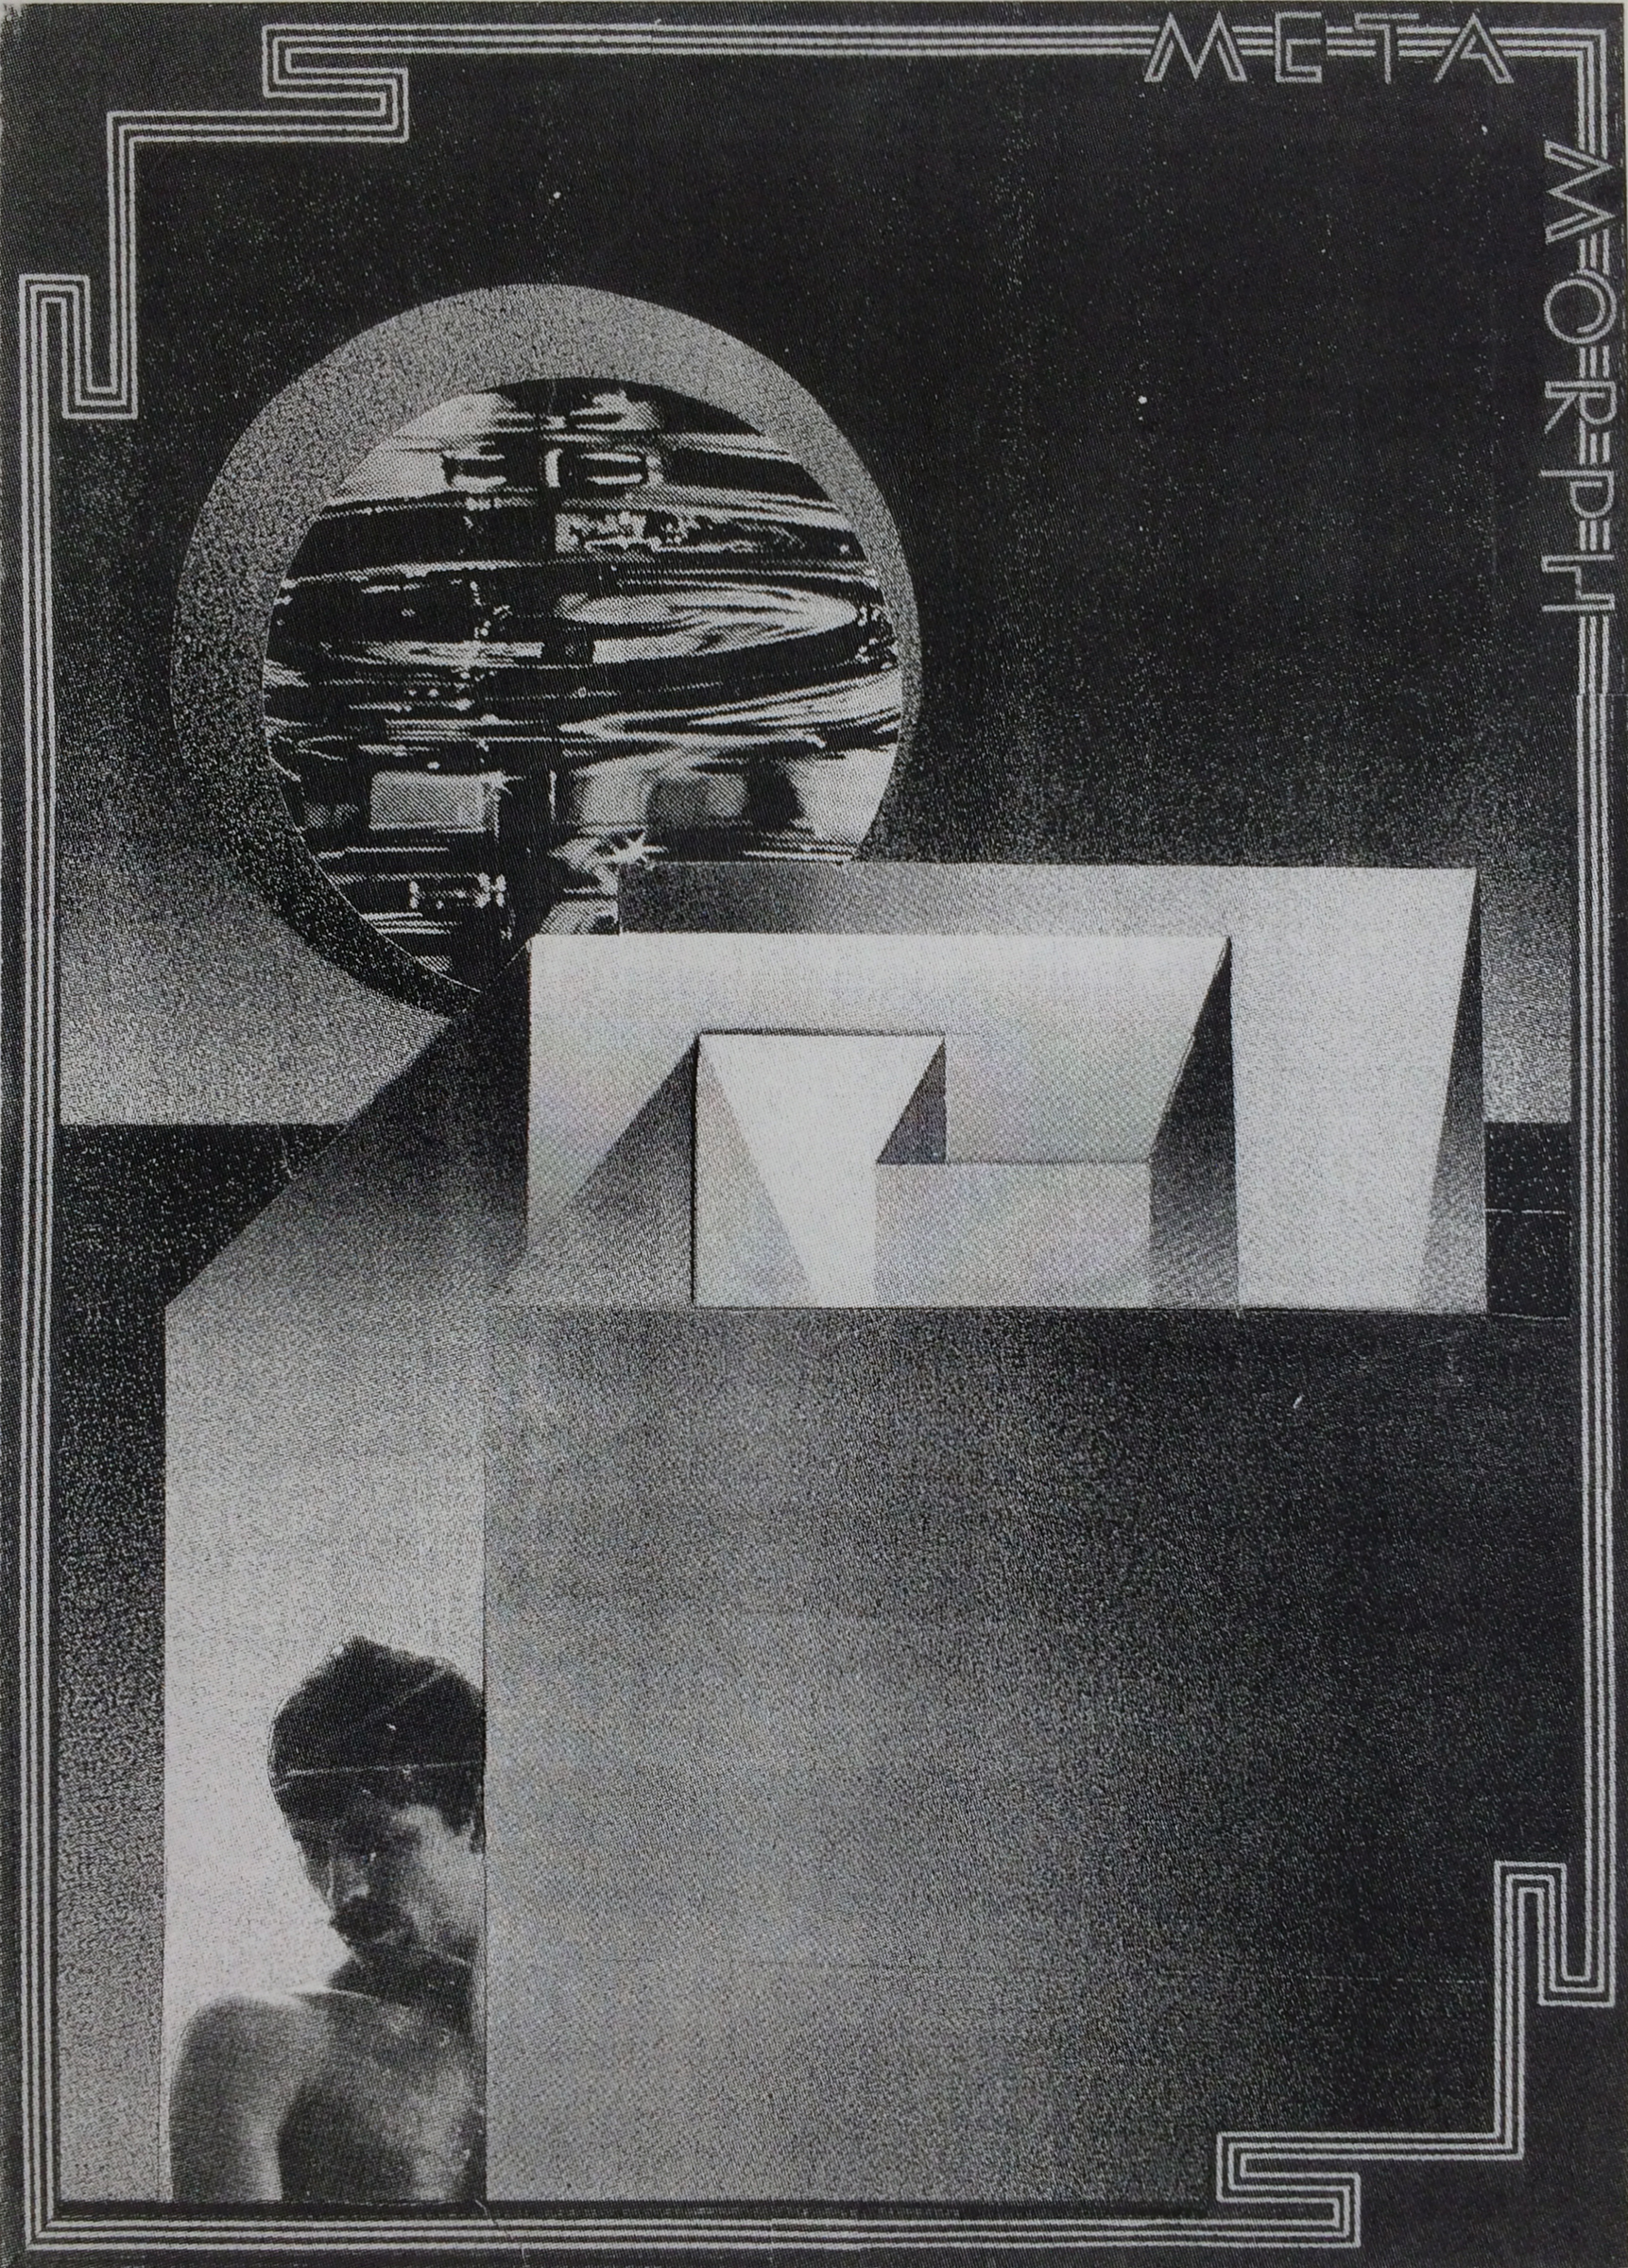 "GWENAËL RATTKE   Metamorph , unique silkscreen on paper (1 of 1), 30.25"" x 22.5"", 2014"